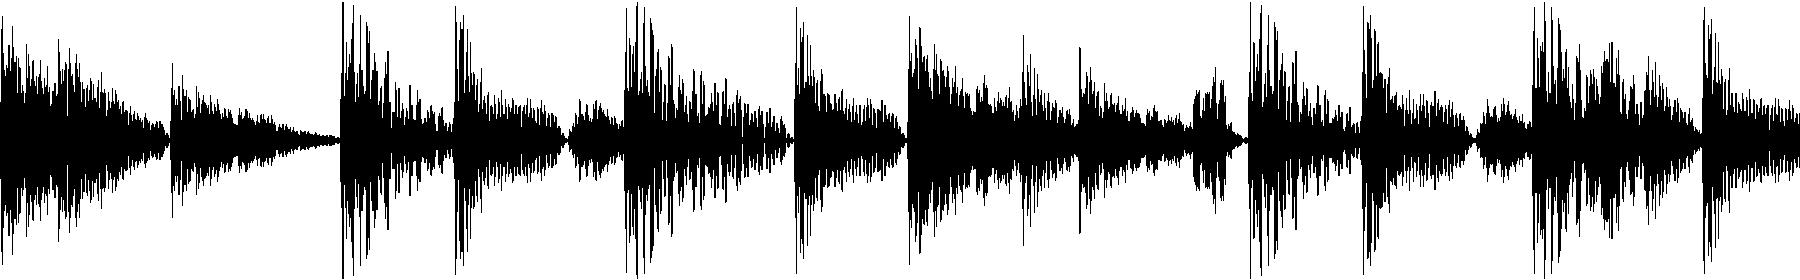 bluezone bc0210 percussion loop 009 110